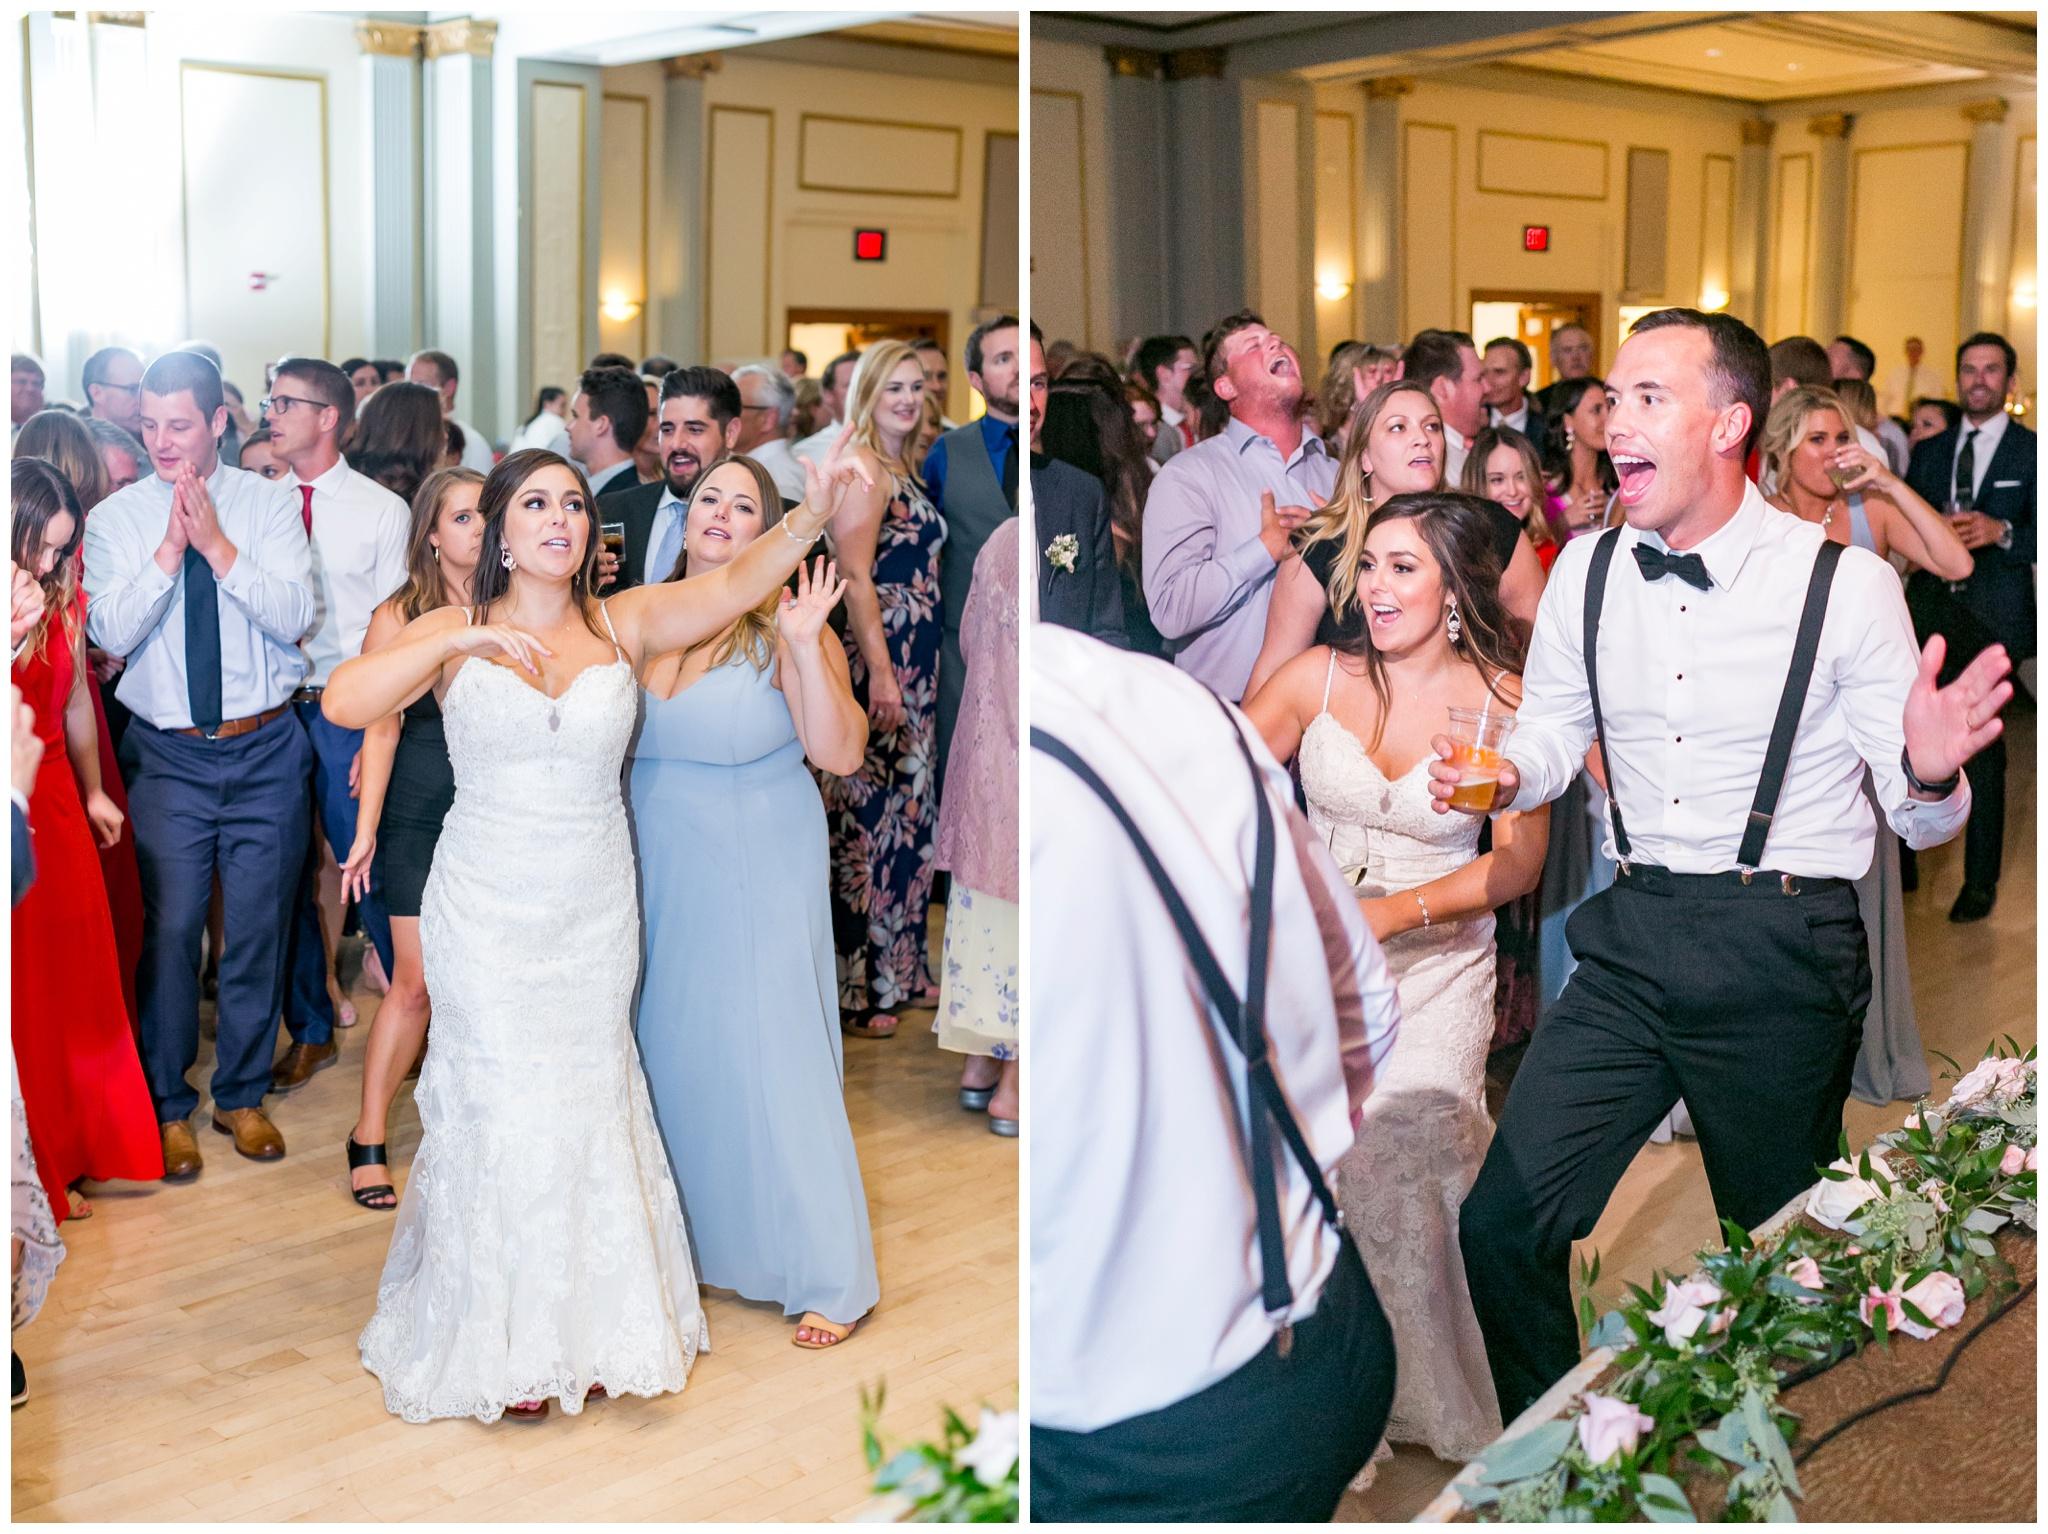 UW_Memorial_Union_wedding_madison_wisconsin_wedding_photographers_4652.jpg